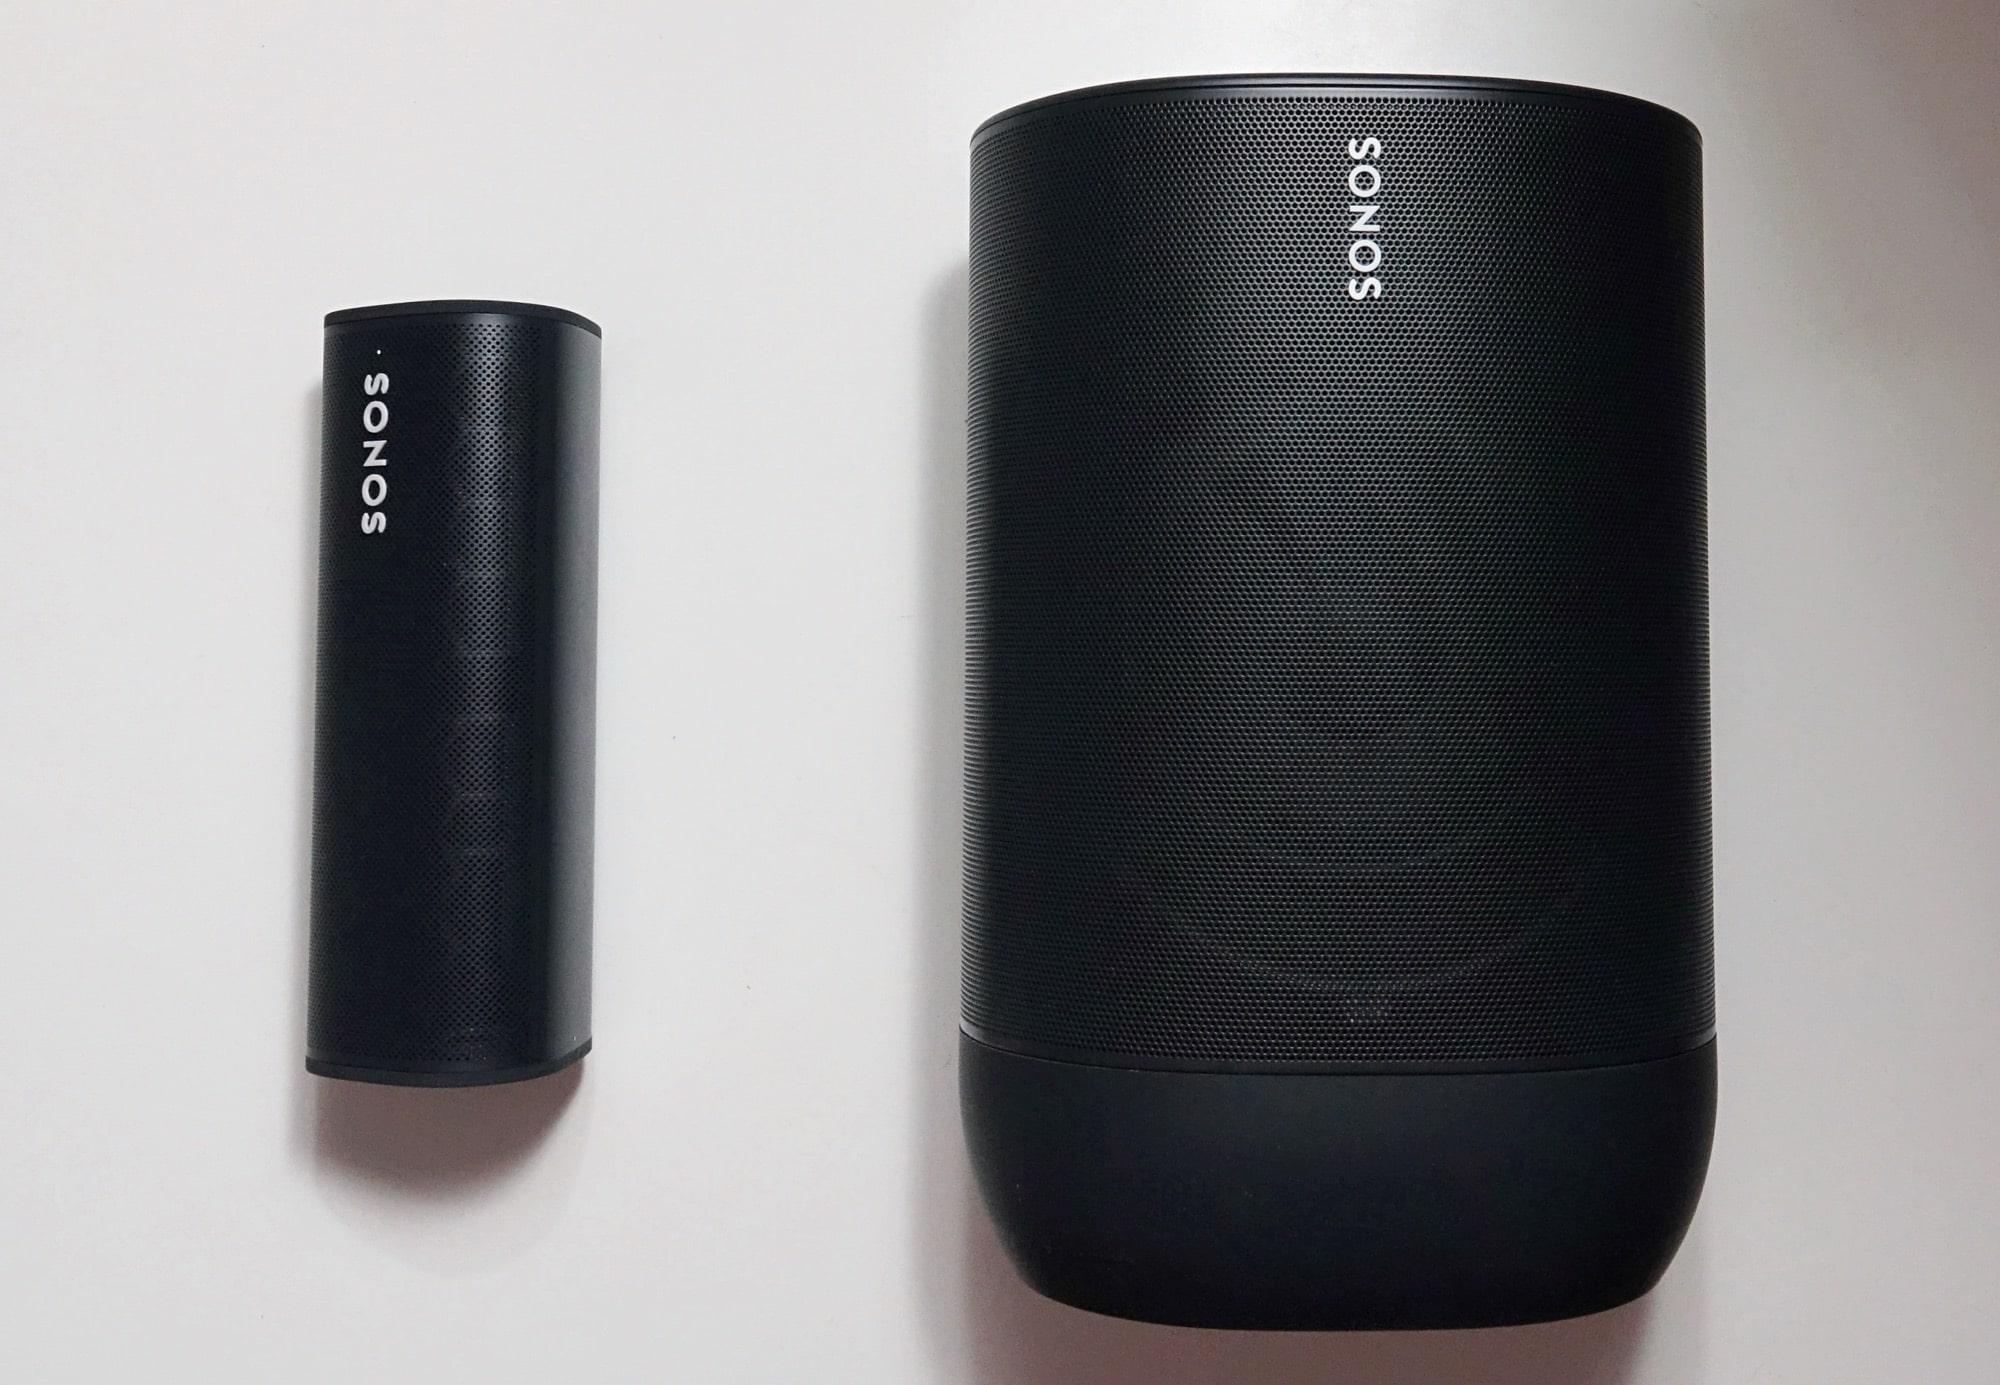 Sonos Roam (left) next to the Sonos Move (right)